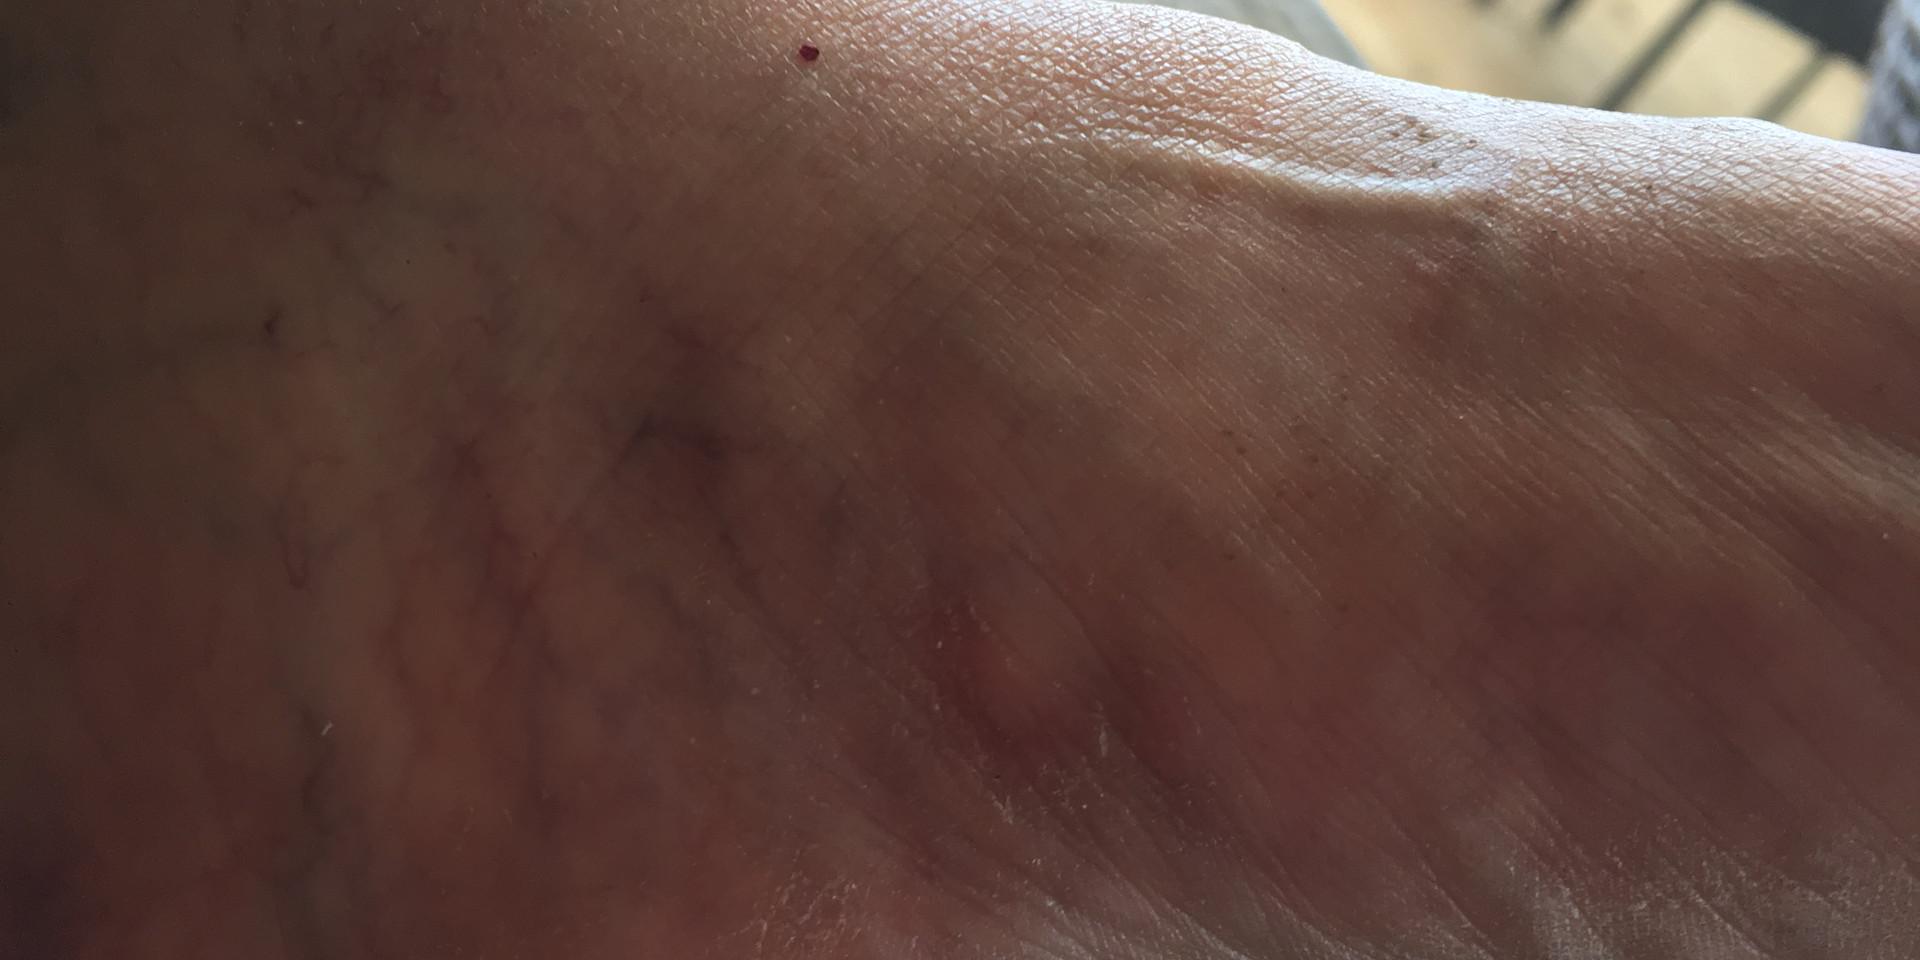 Healed cut 4 weeks later